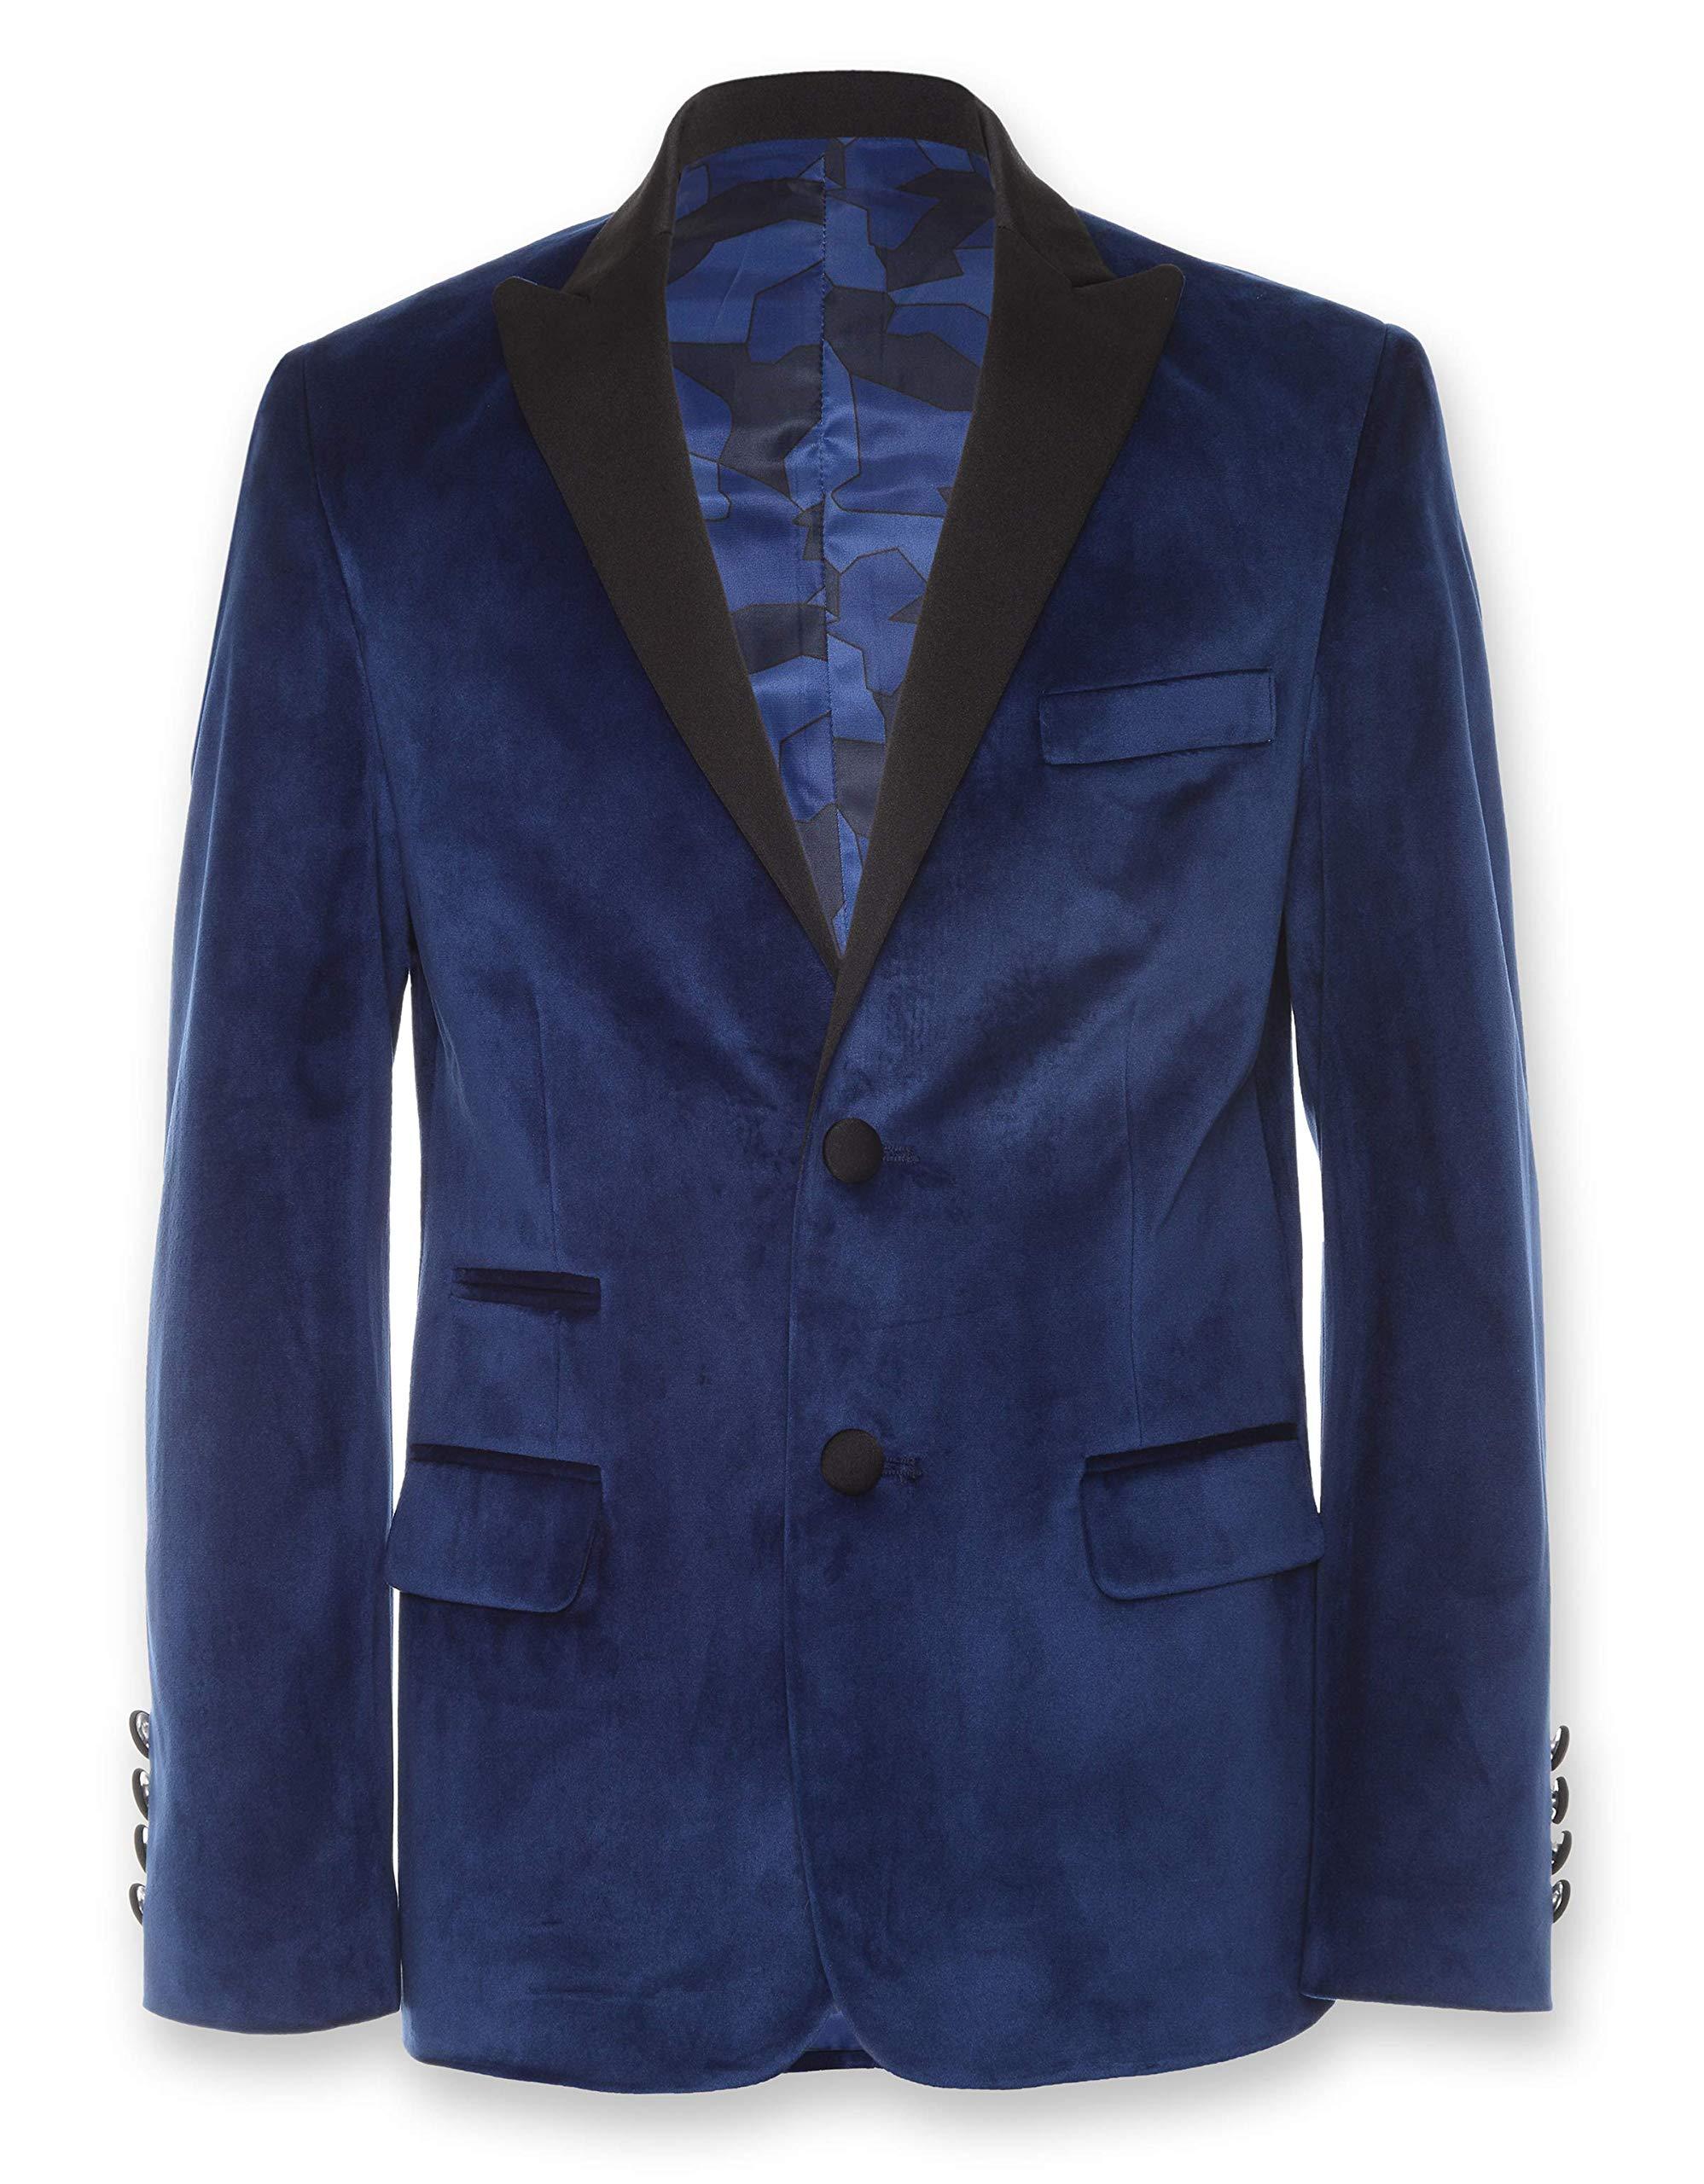 Calvin Klein Big Boys' Velvet Blazer Jacket, Flag Blue, 8